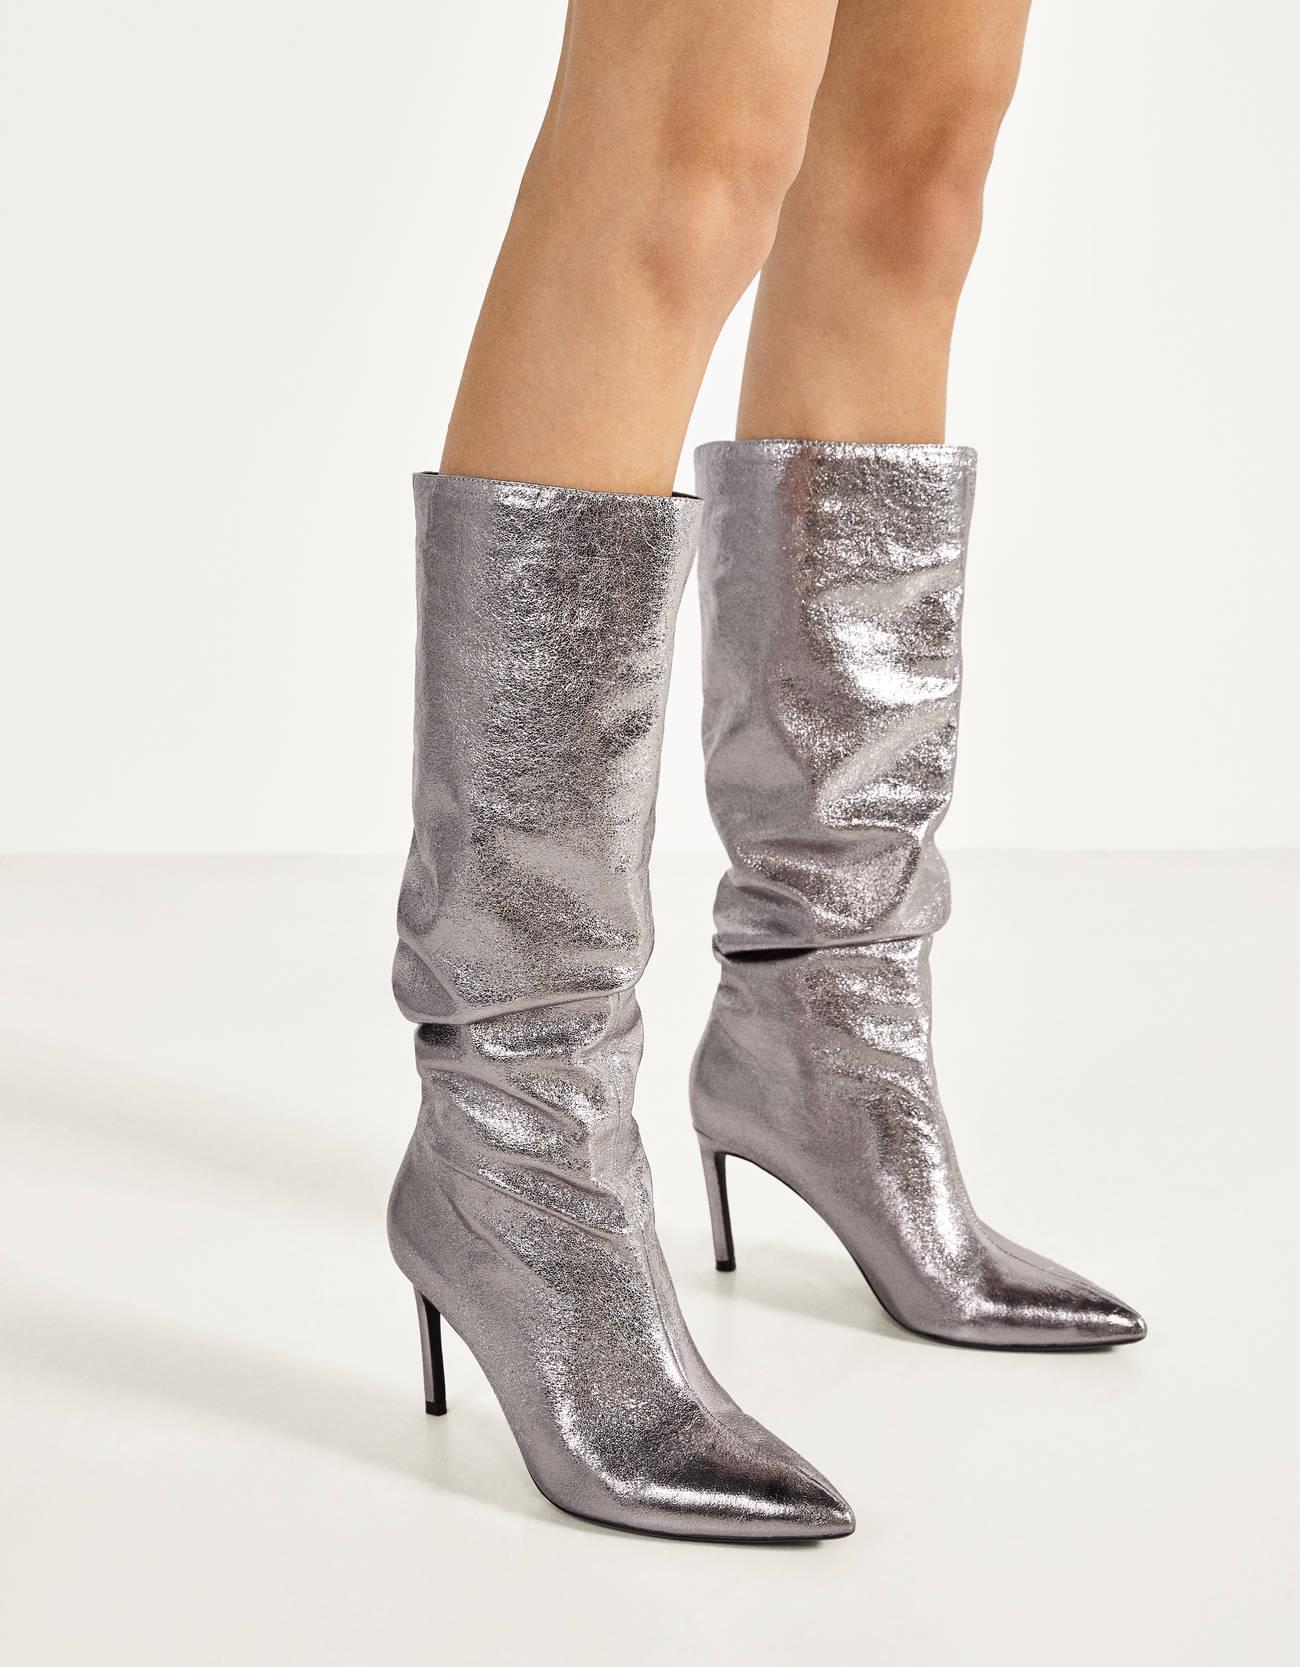 Botas metalizadas de caña arrugada